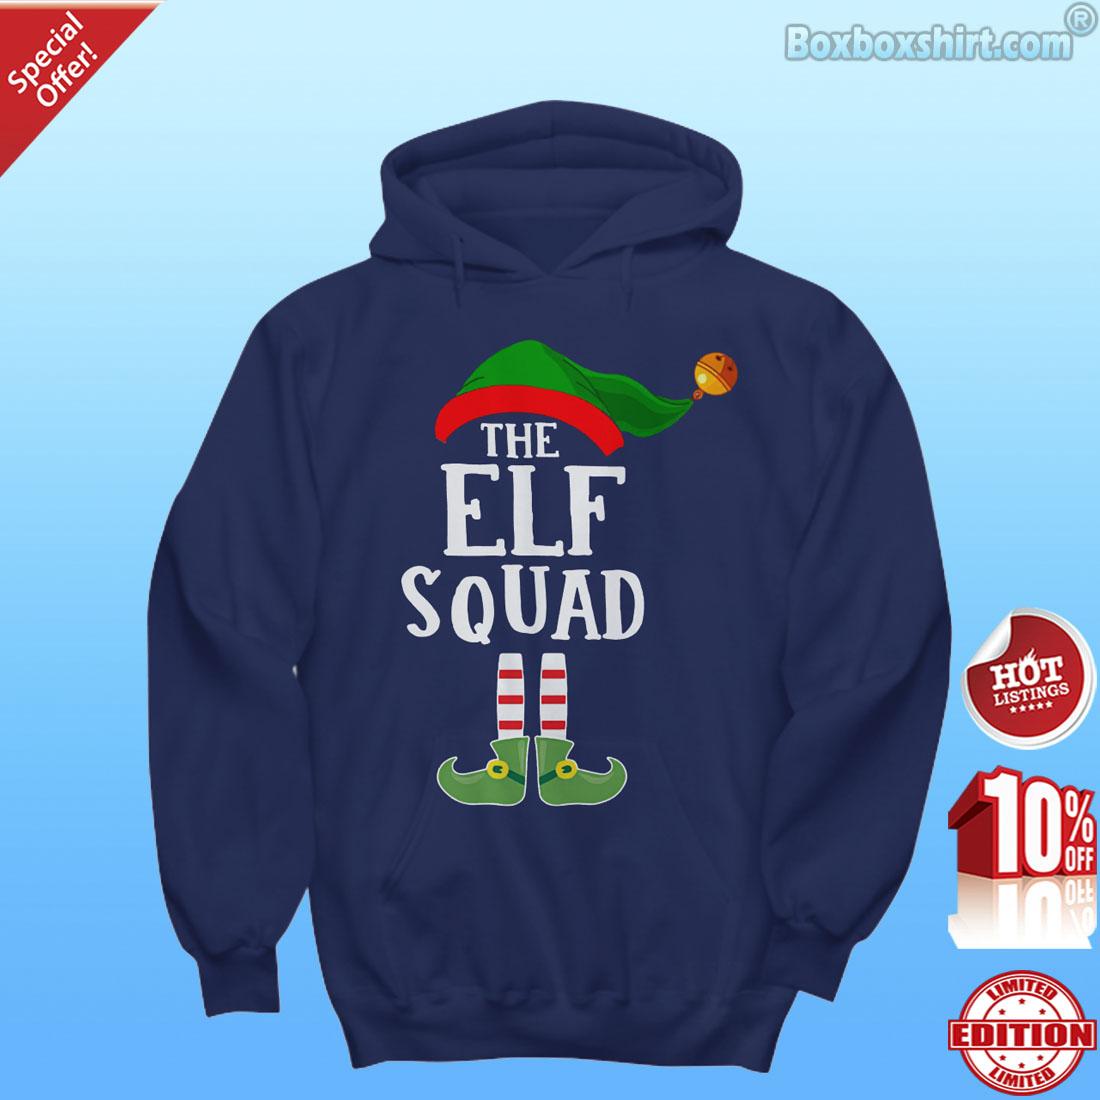 The ELF squad Christmas shirt